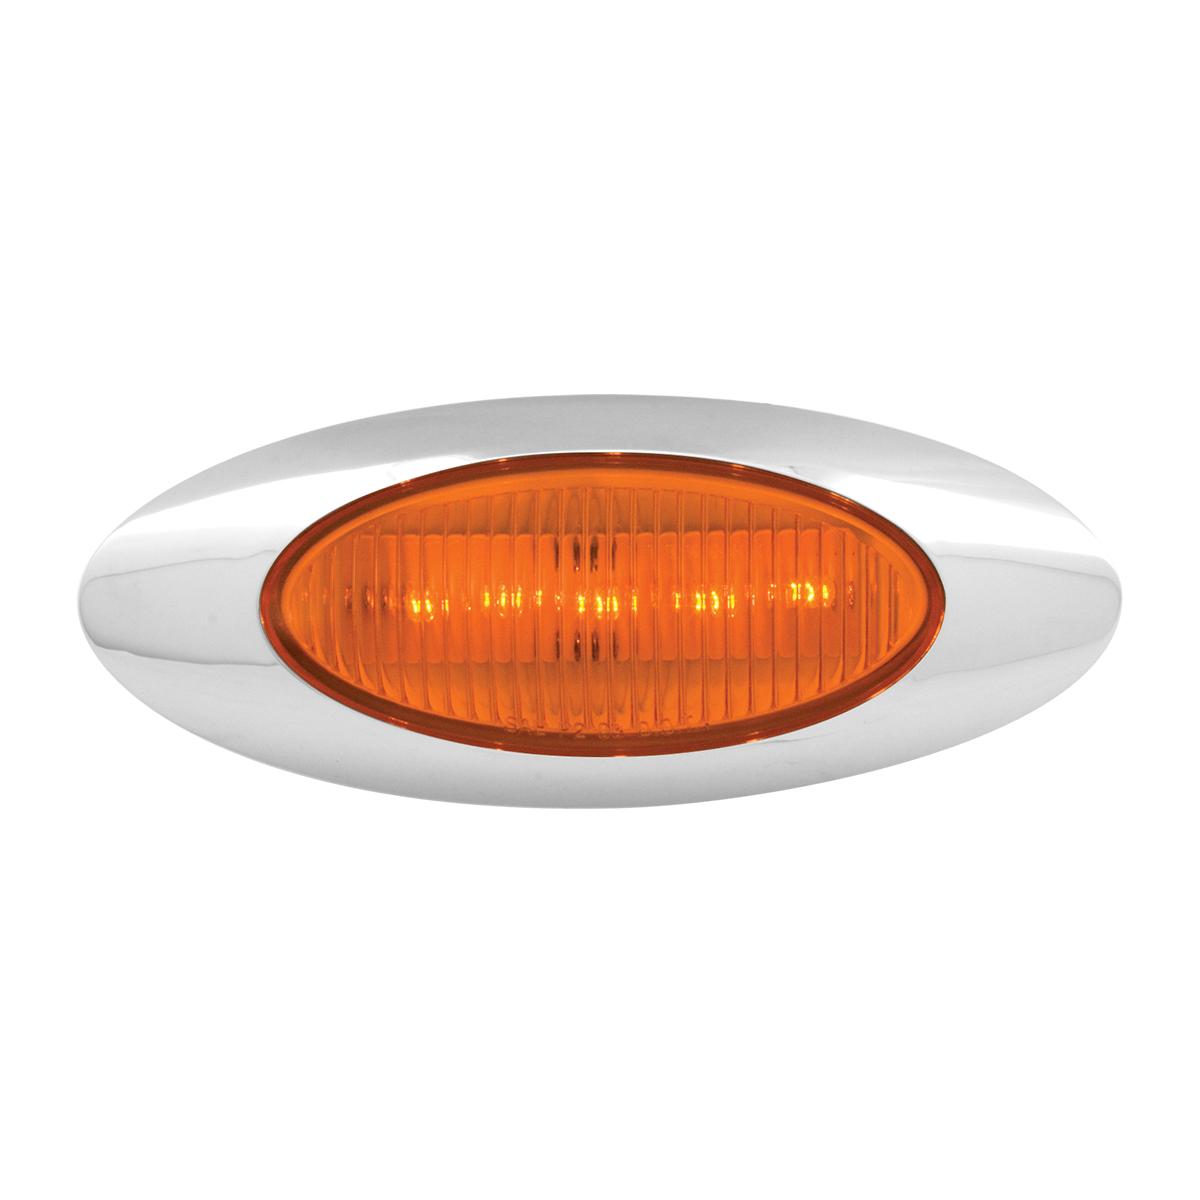 #79460 Plug In Y2K Marker Amber Light - 5 Bulbs